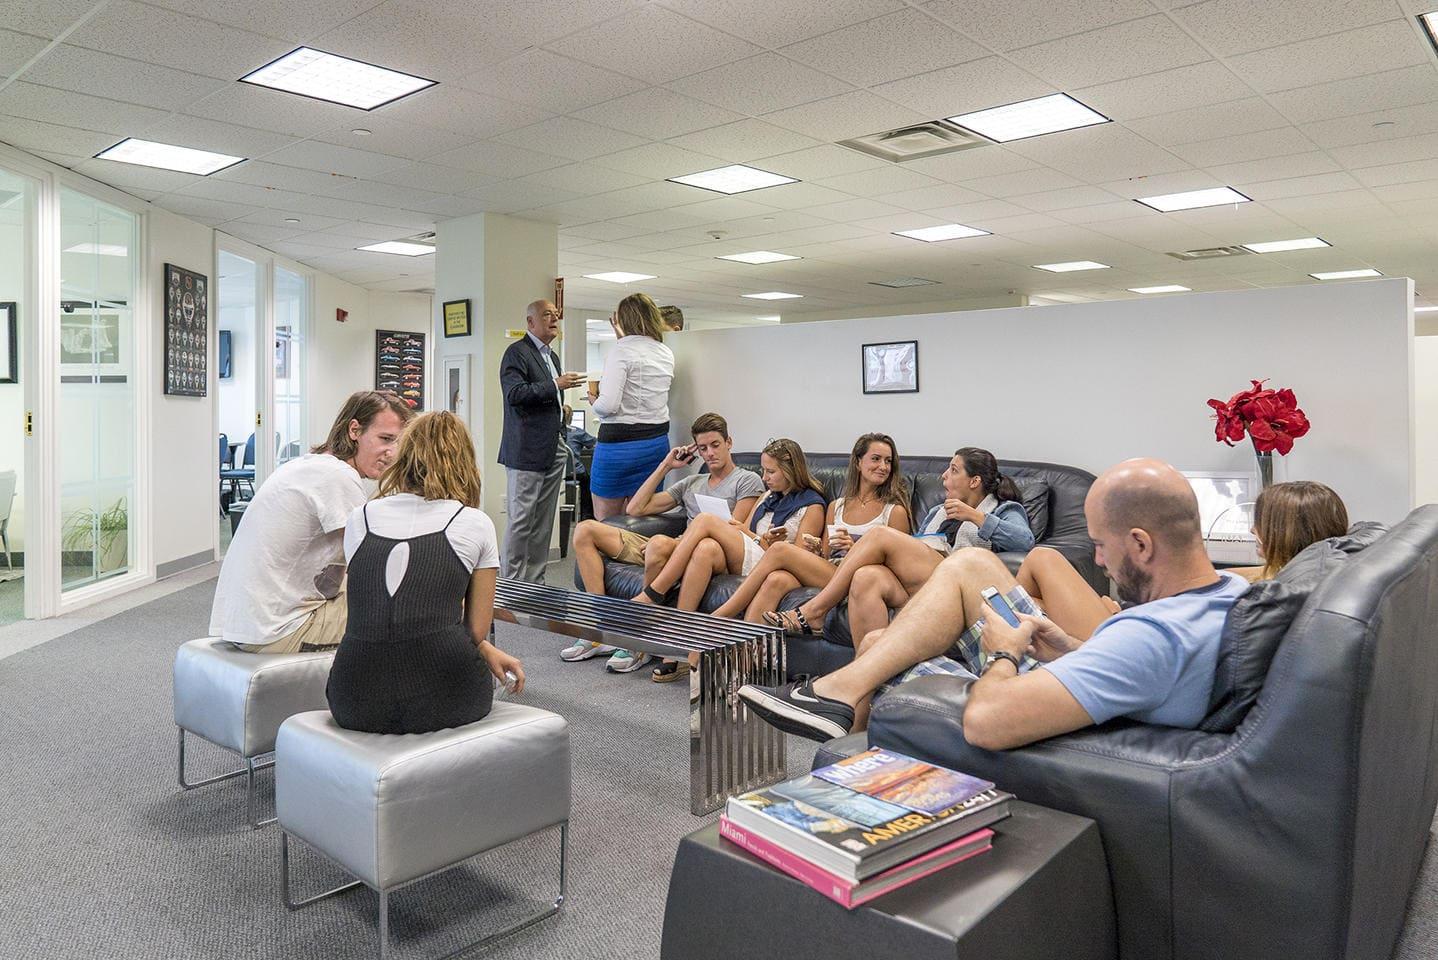 vacanze studio 2020 corsi d'inglese